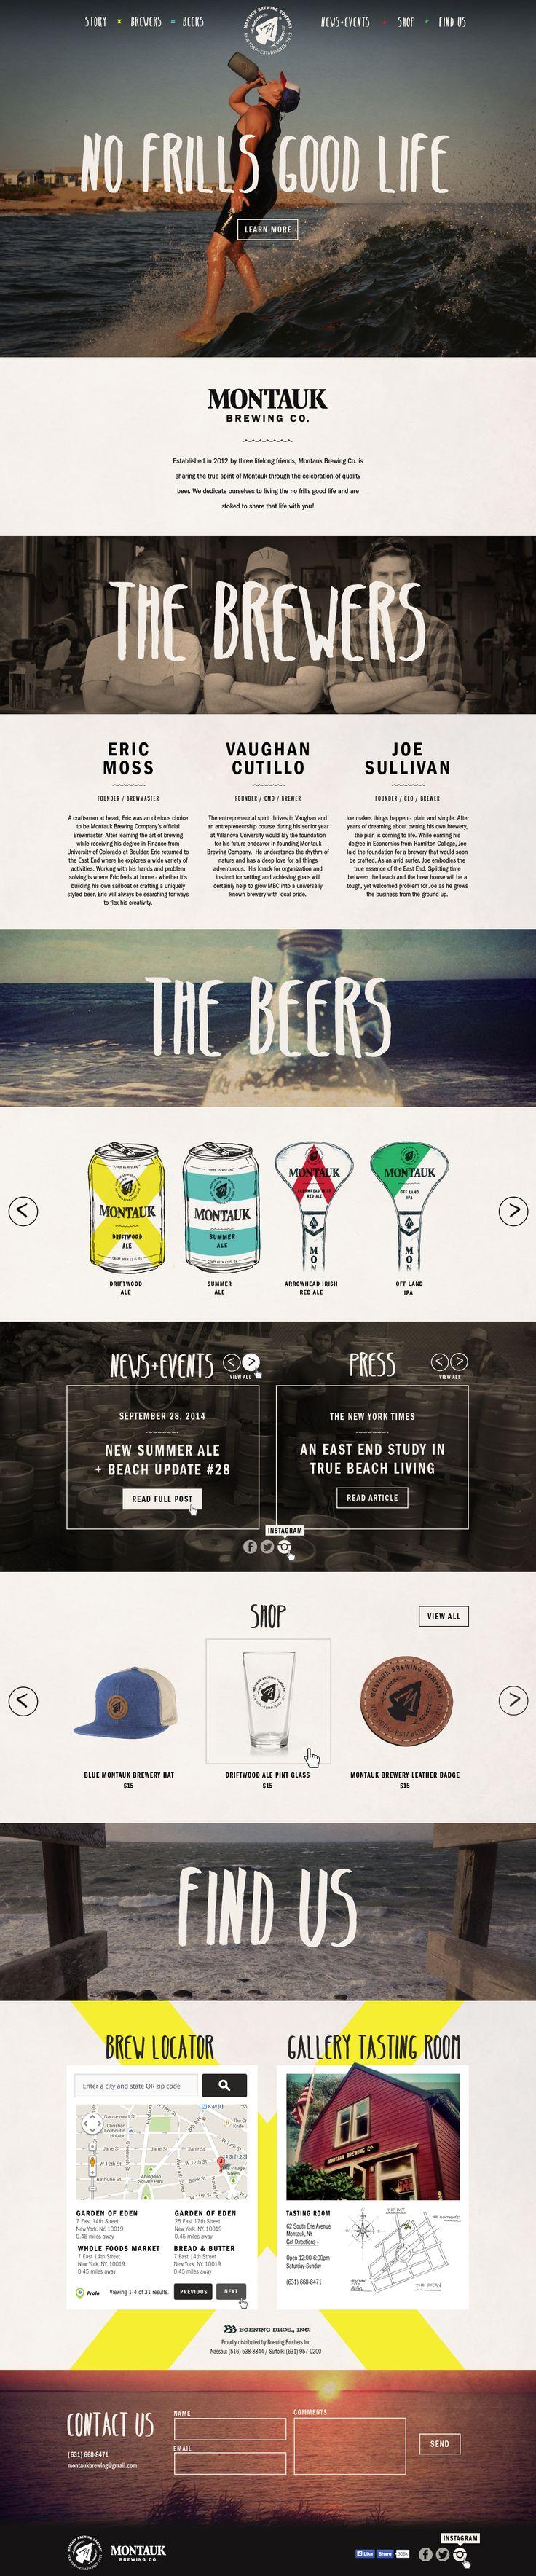 Unique Web Design, Montauk Brewery Co. #Webdesign #Design…